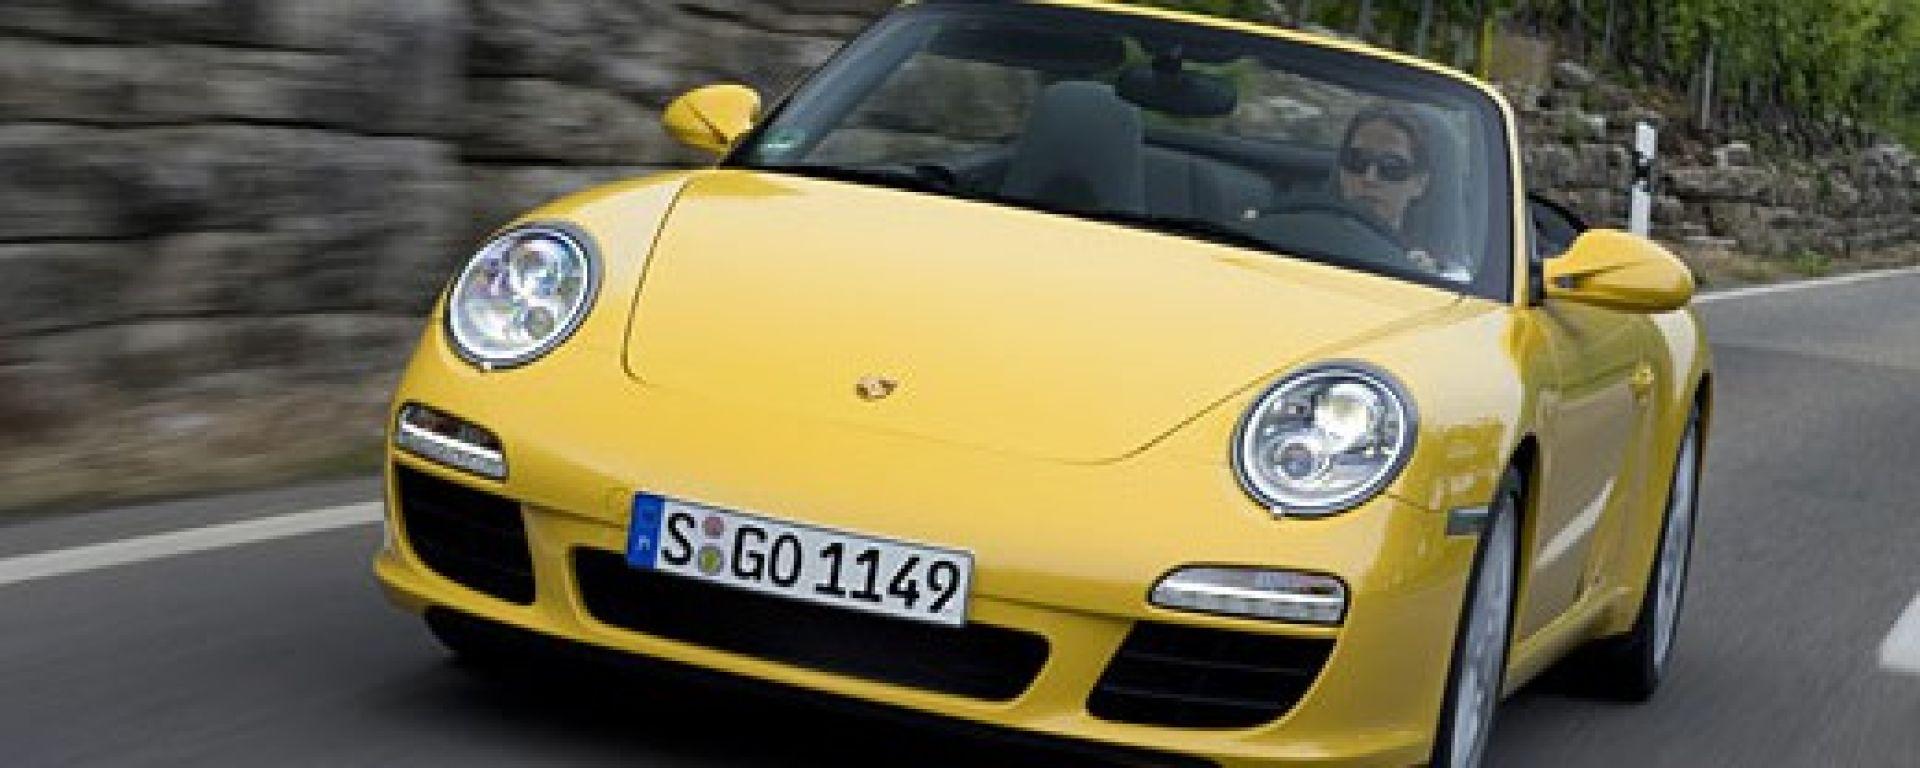 Porsche 911 Carrera 2009